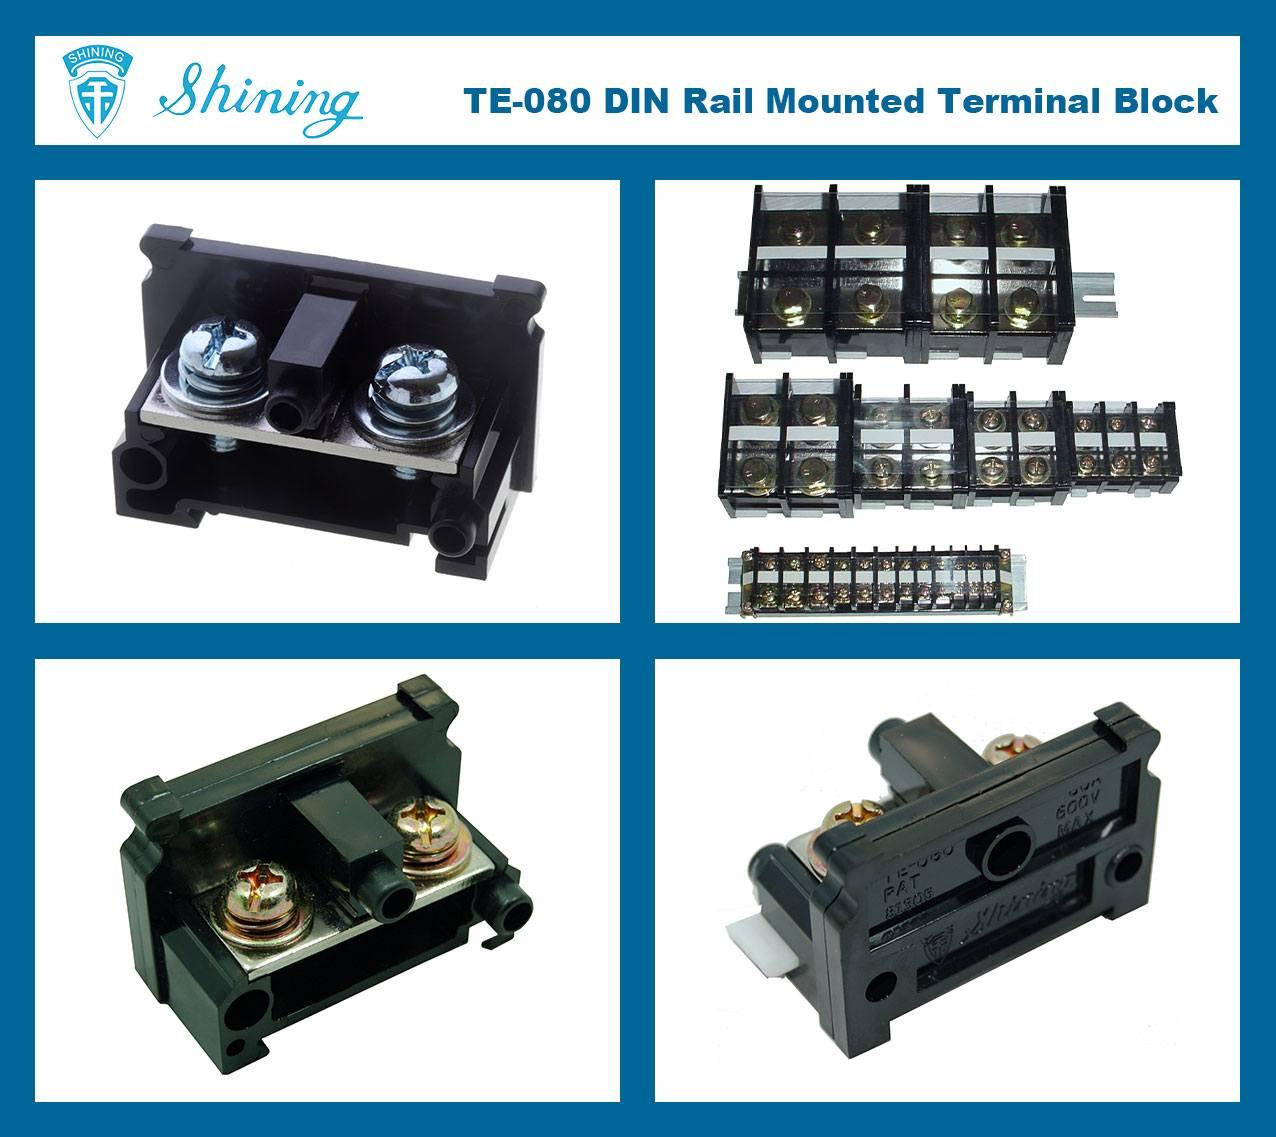 SHINING-TE-080 35mm Din Rail Mounted Assembly Type 600V 80A Terminal Strip